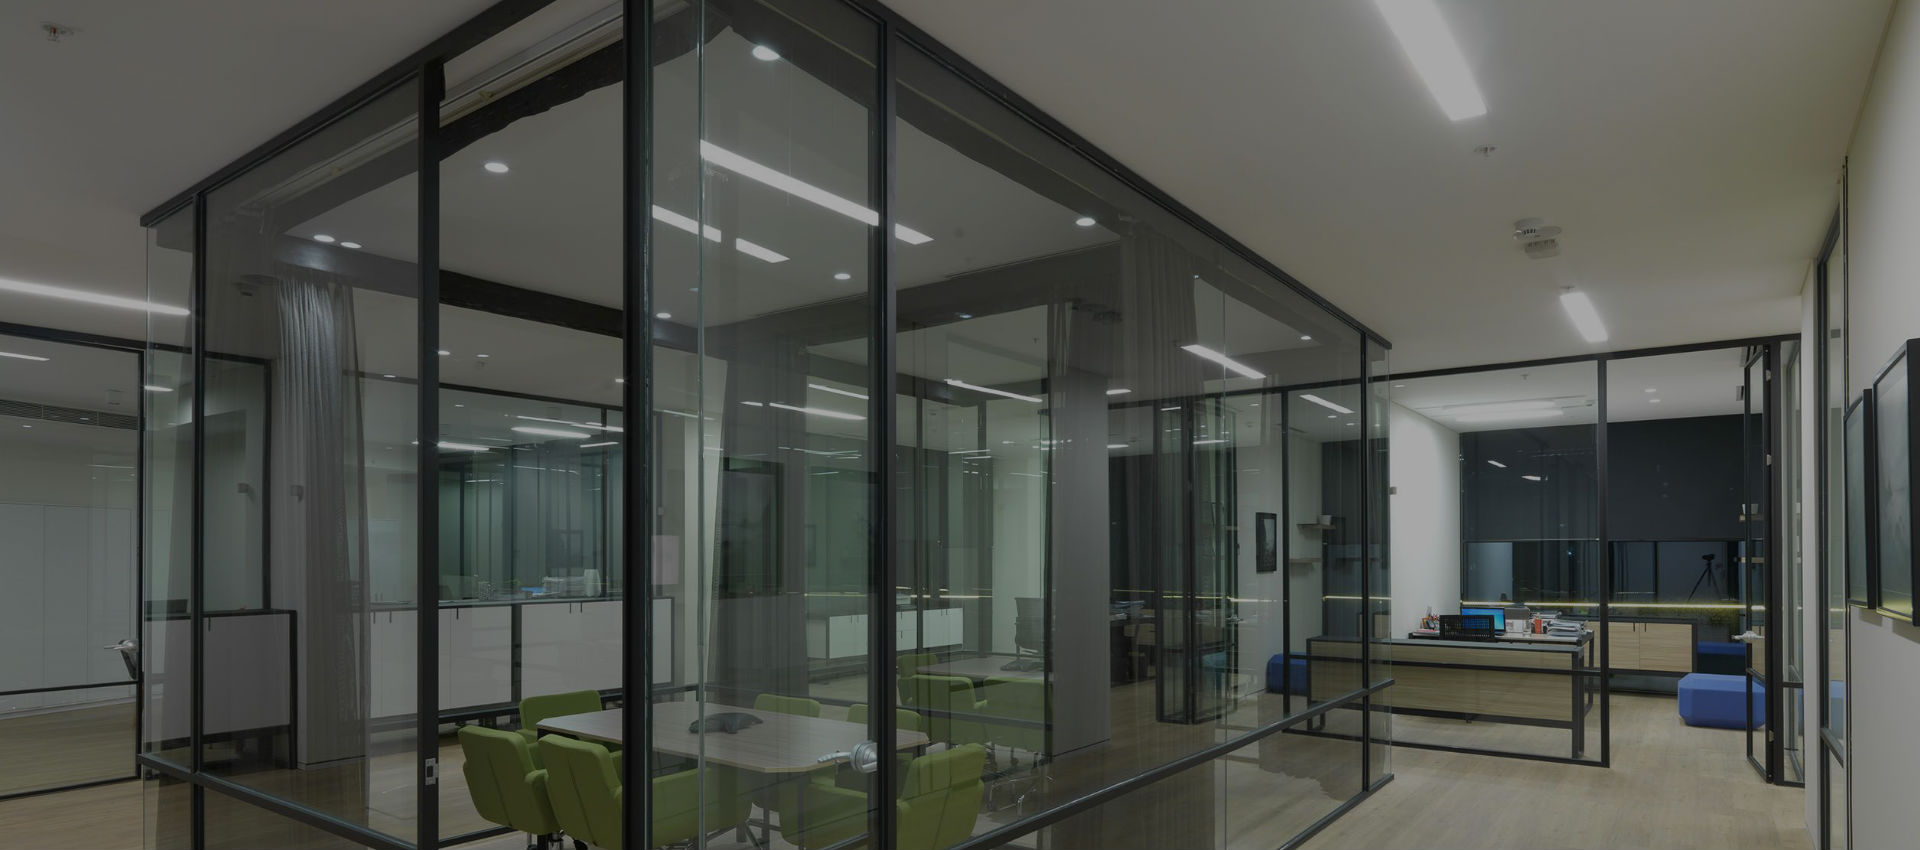 Partition Installation & Modification